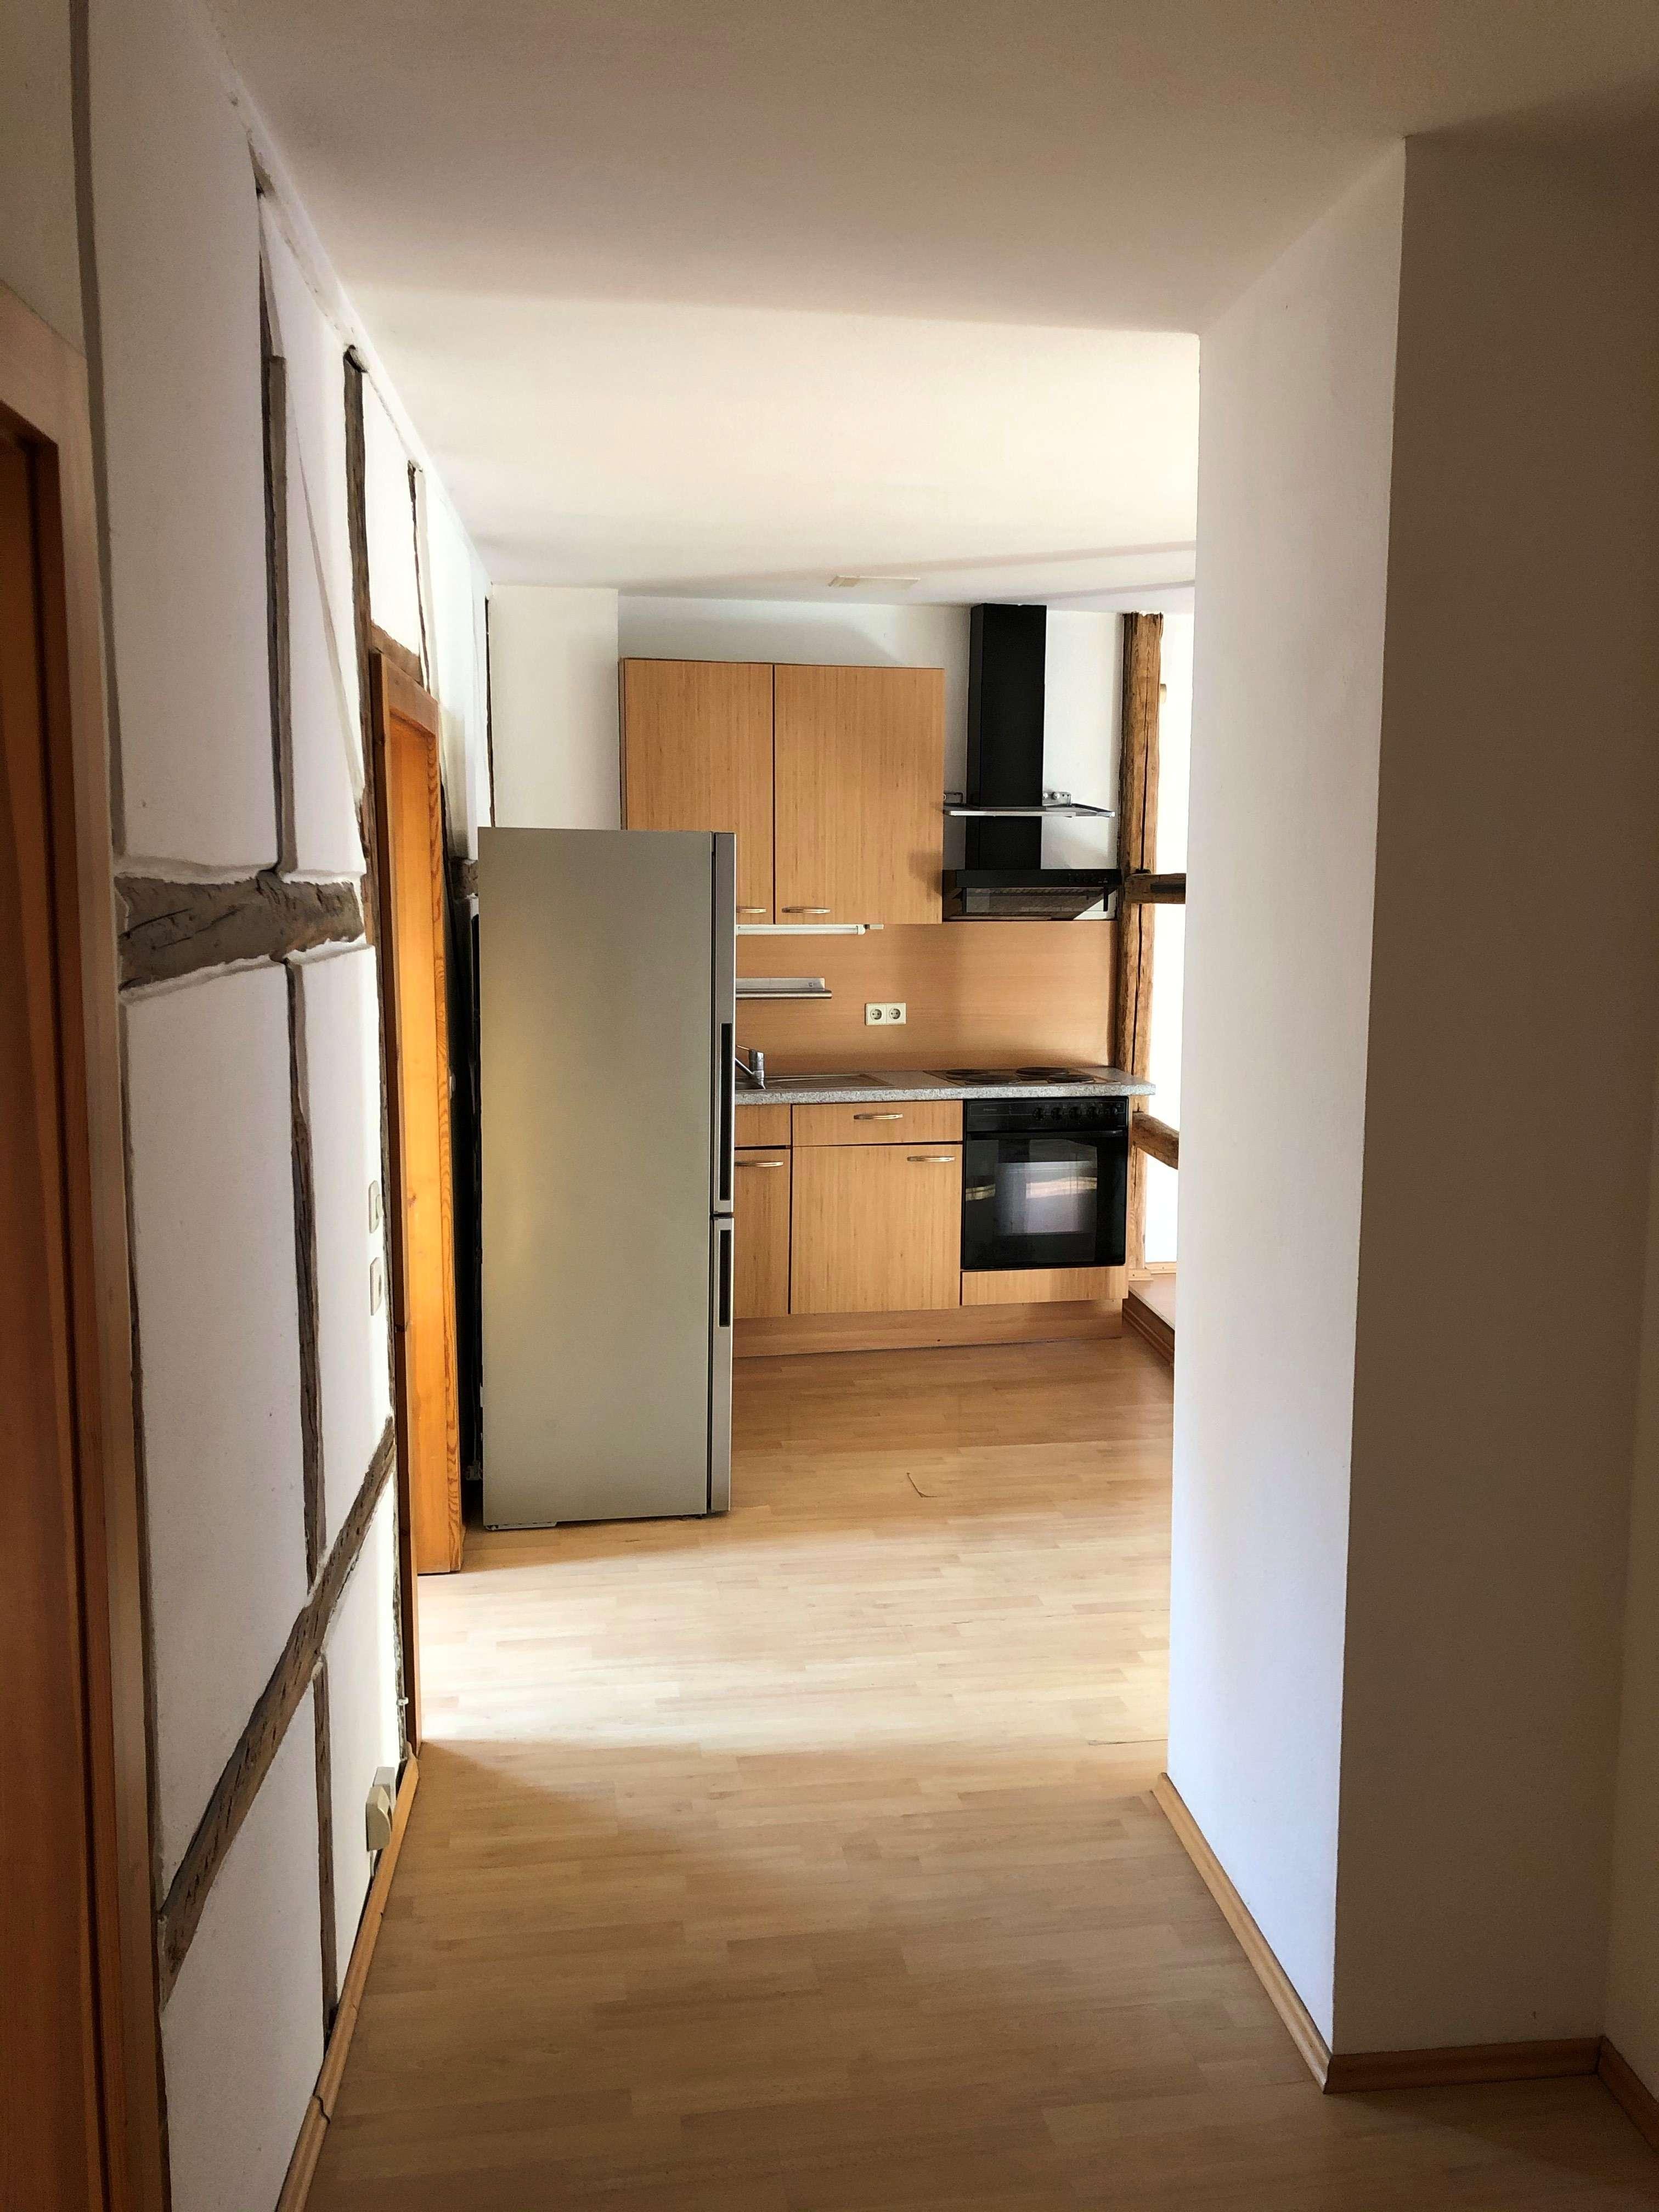 Gepflegte 2-Zimmer-DG-Wohnung mit EBK in Nürnberg in Altstadt, St. Sebald (Nürnberg)